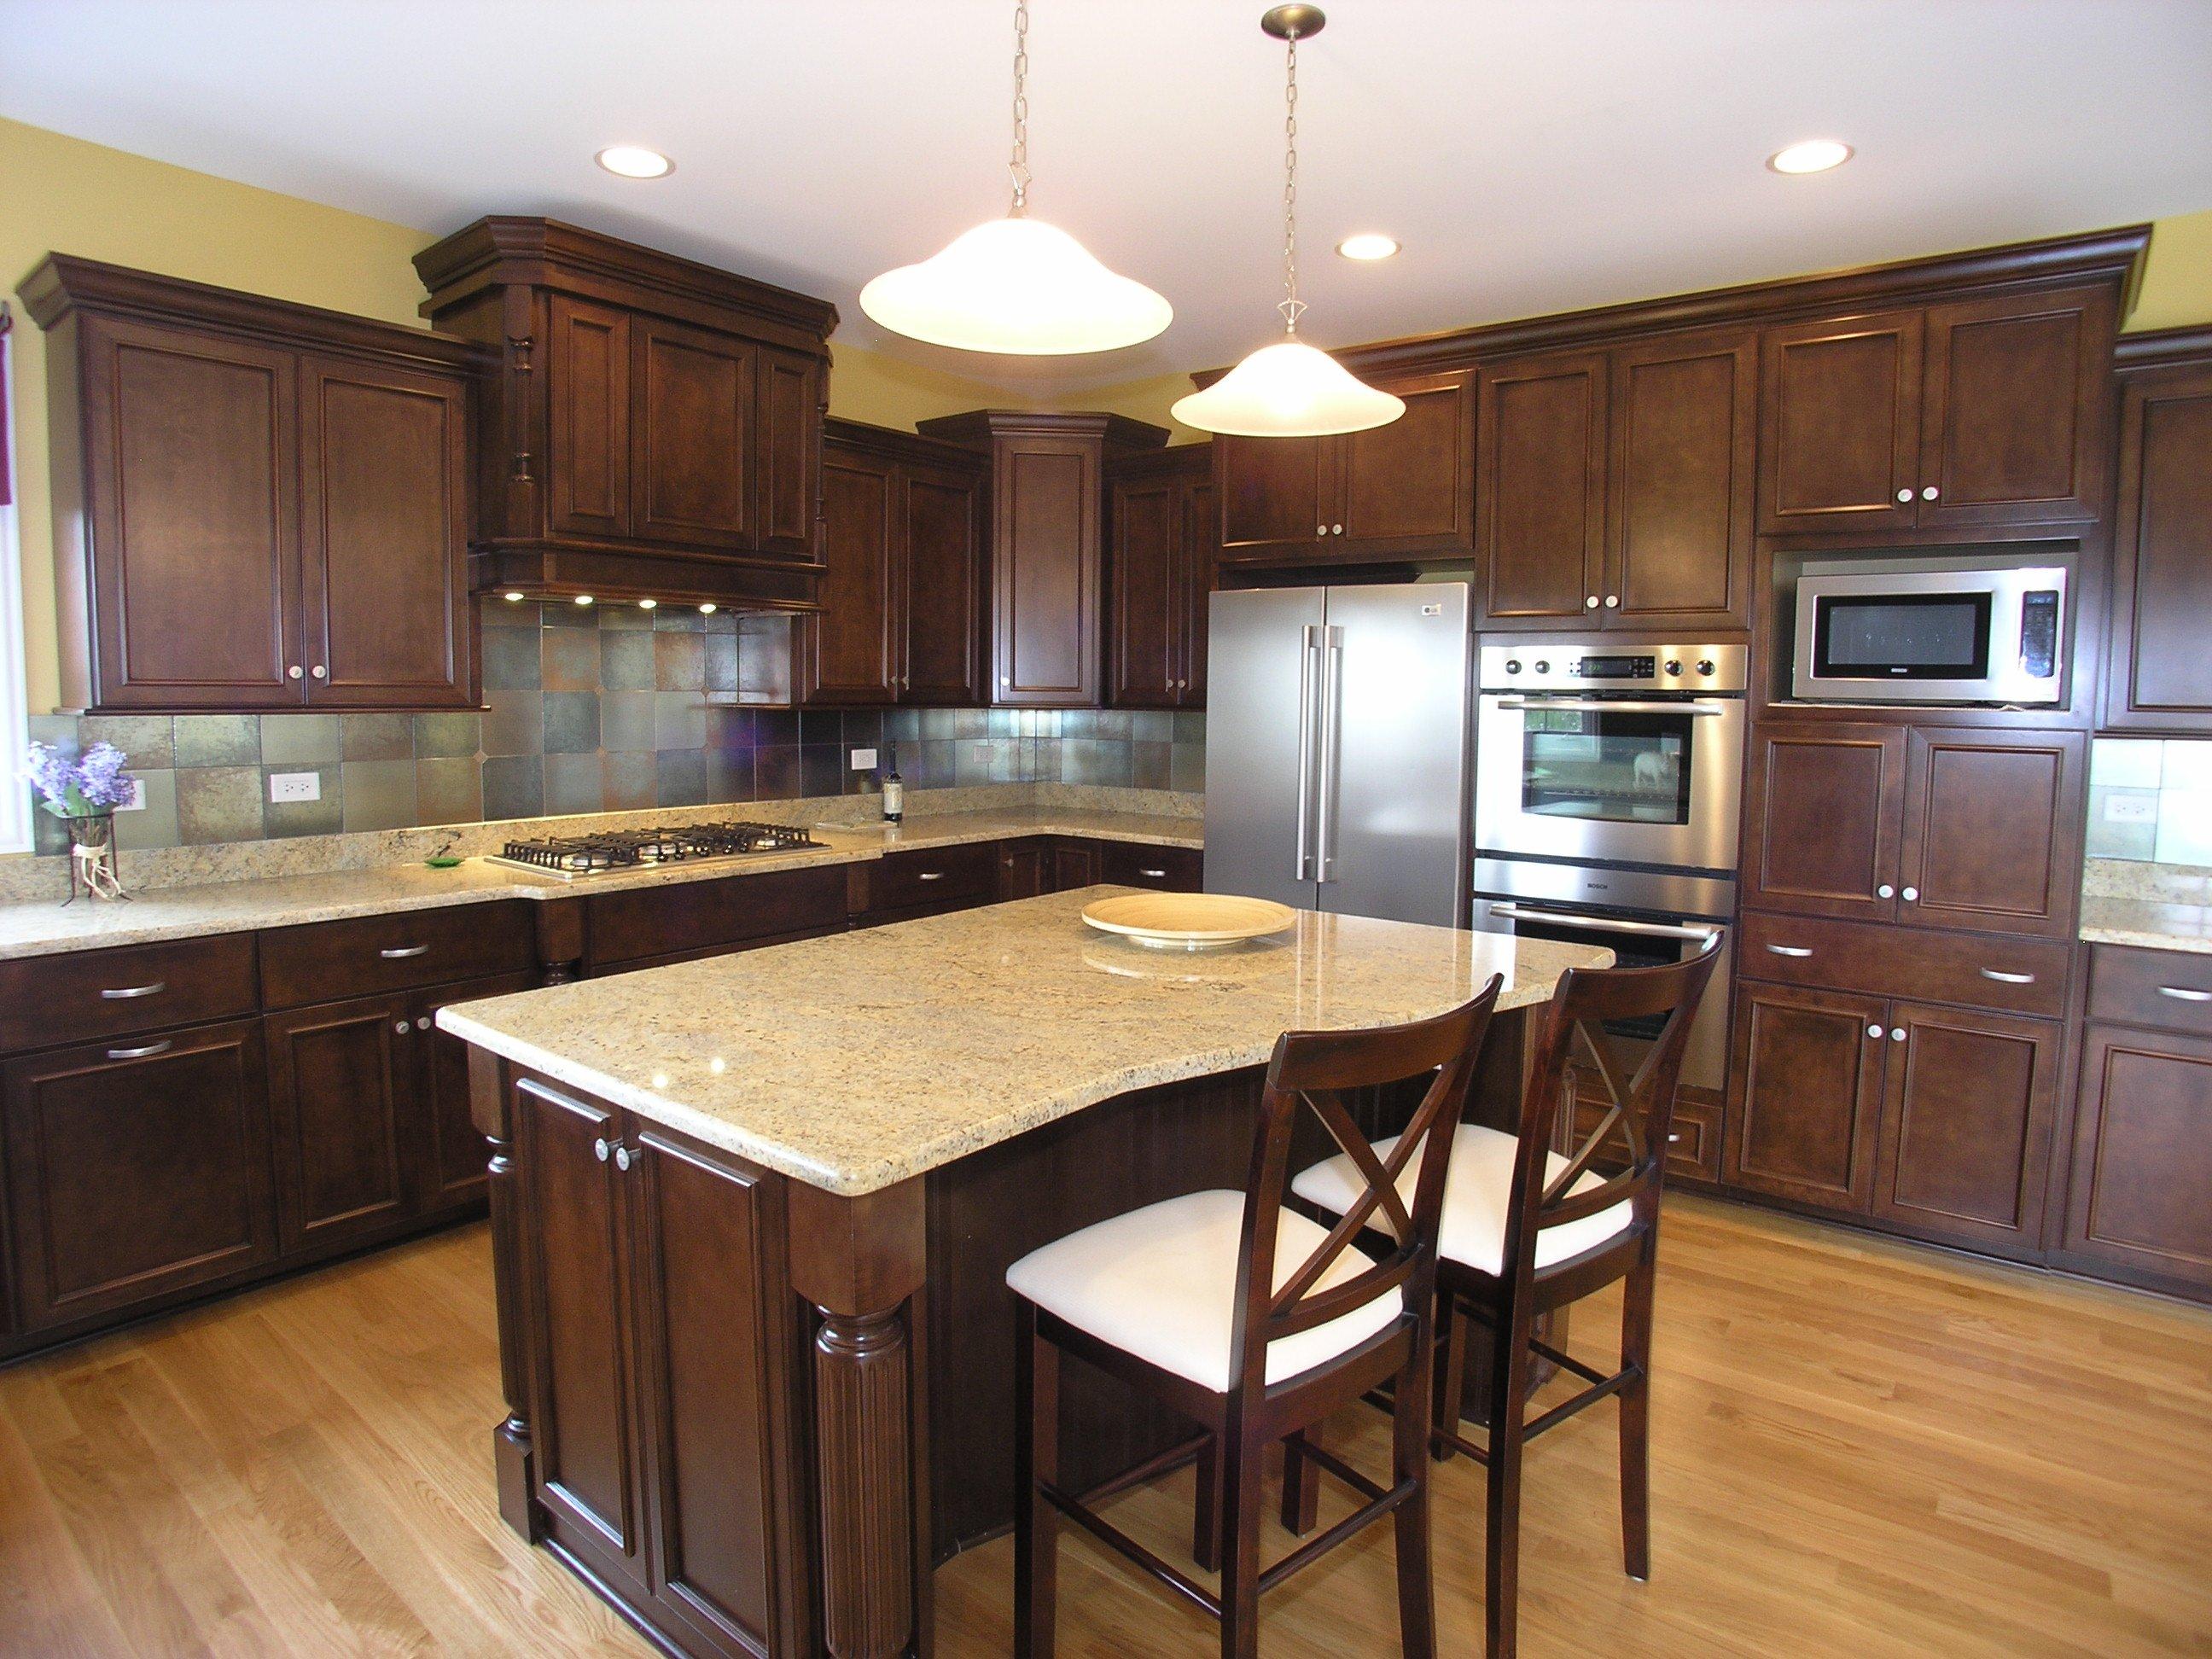 stone countertops st louis mo inexpensive kitchen countertops Granite Kashmir White Kitchen Dark Cabinets Stone Island Neutral